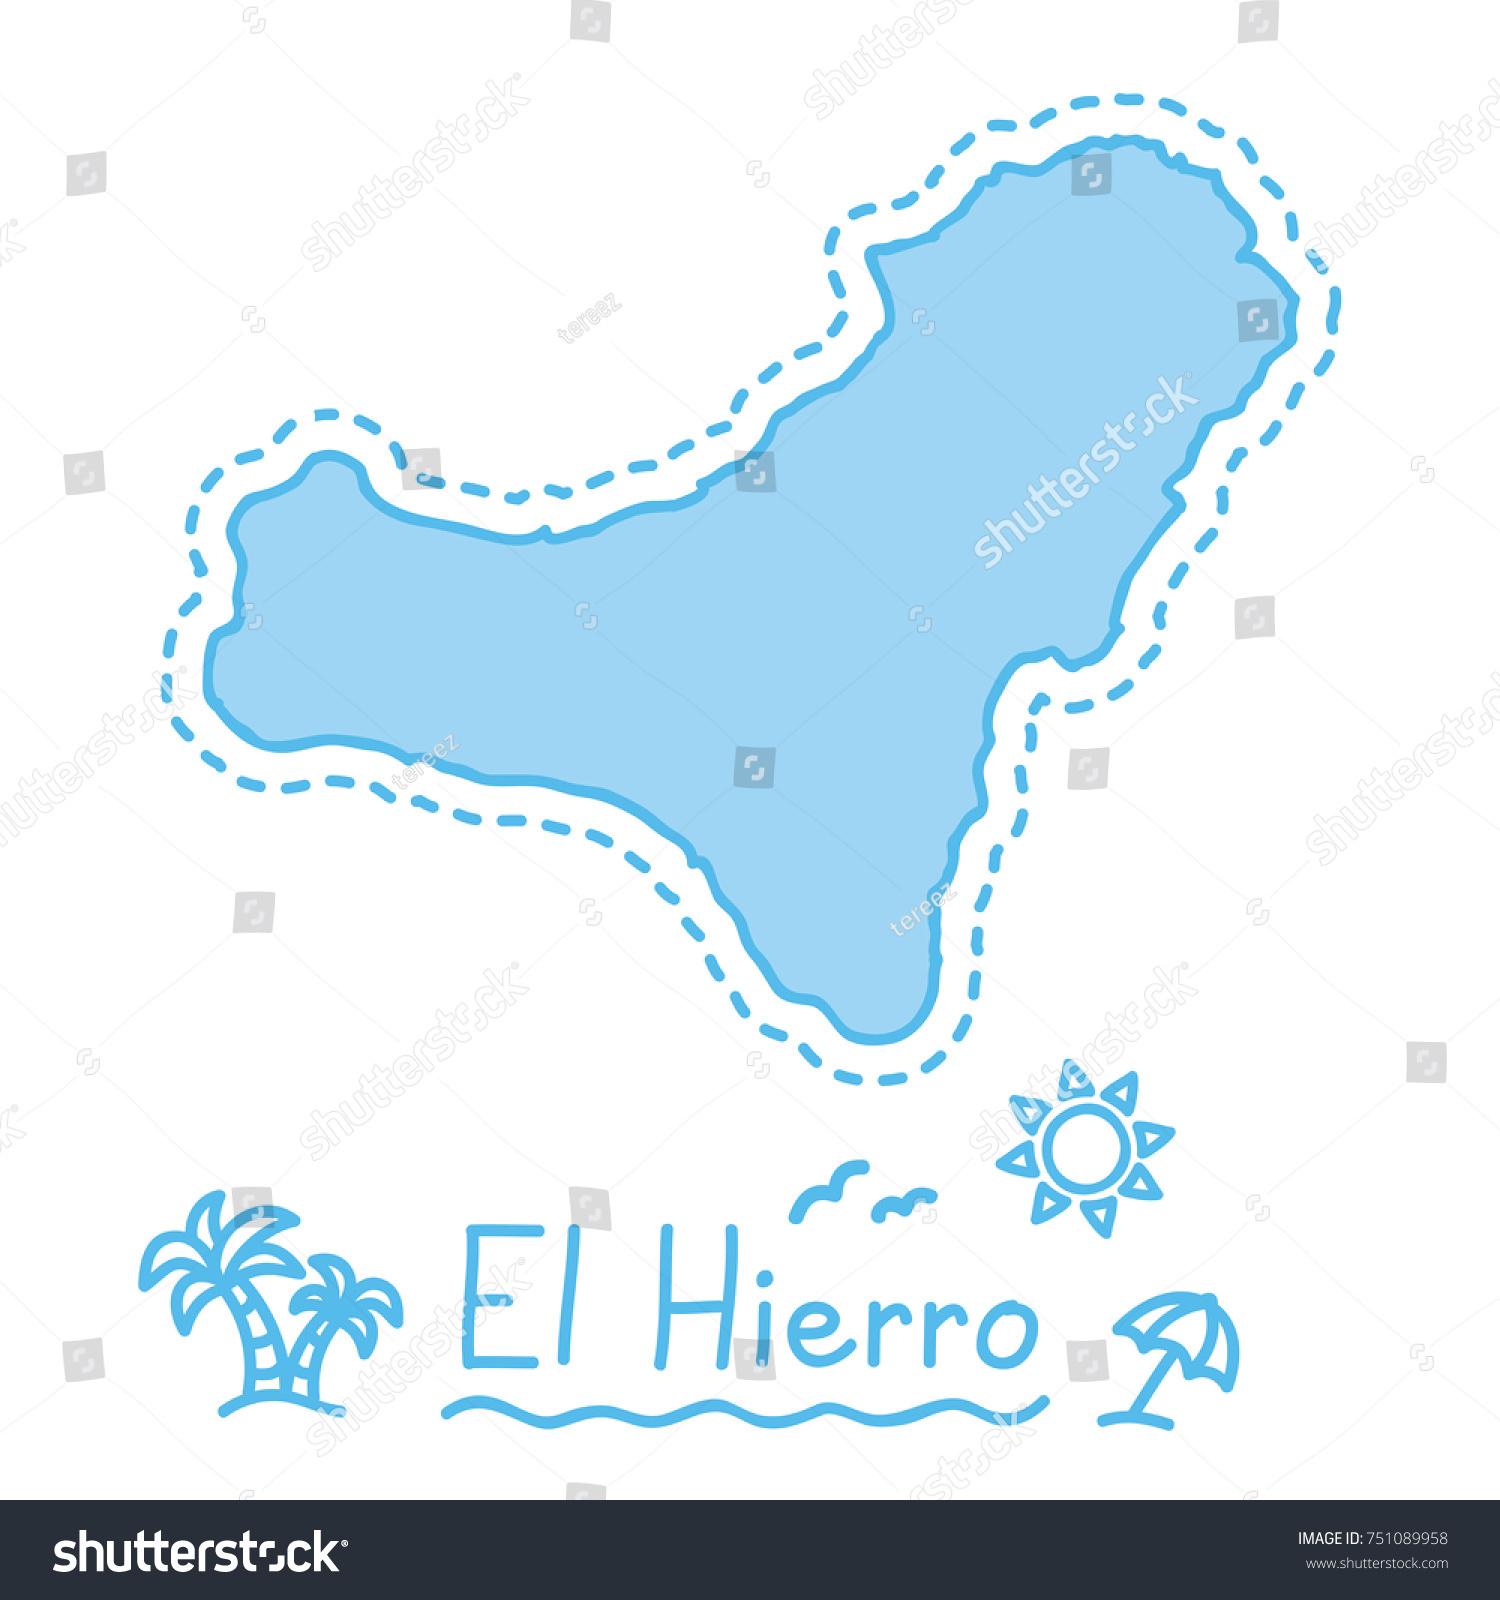 El Hierro Island Map Isolated Cartography Stock Vector 751089958